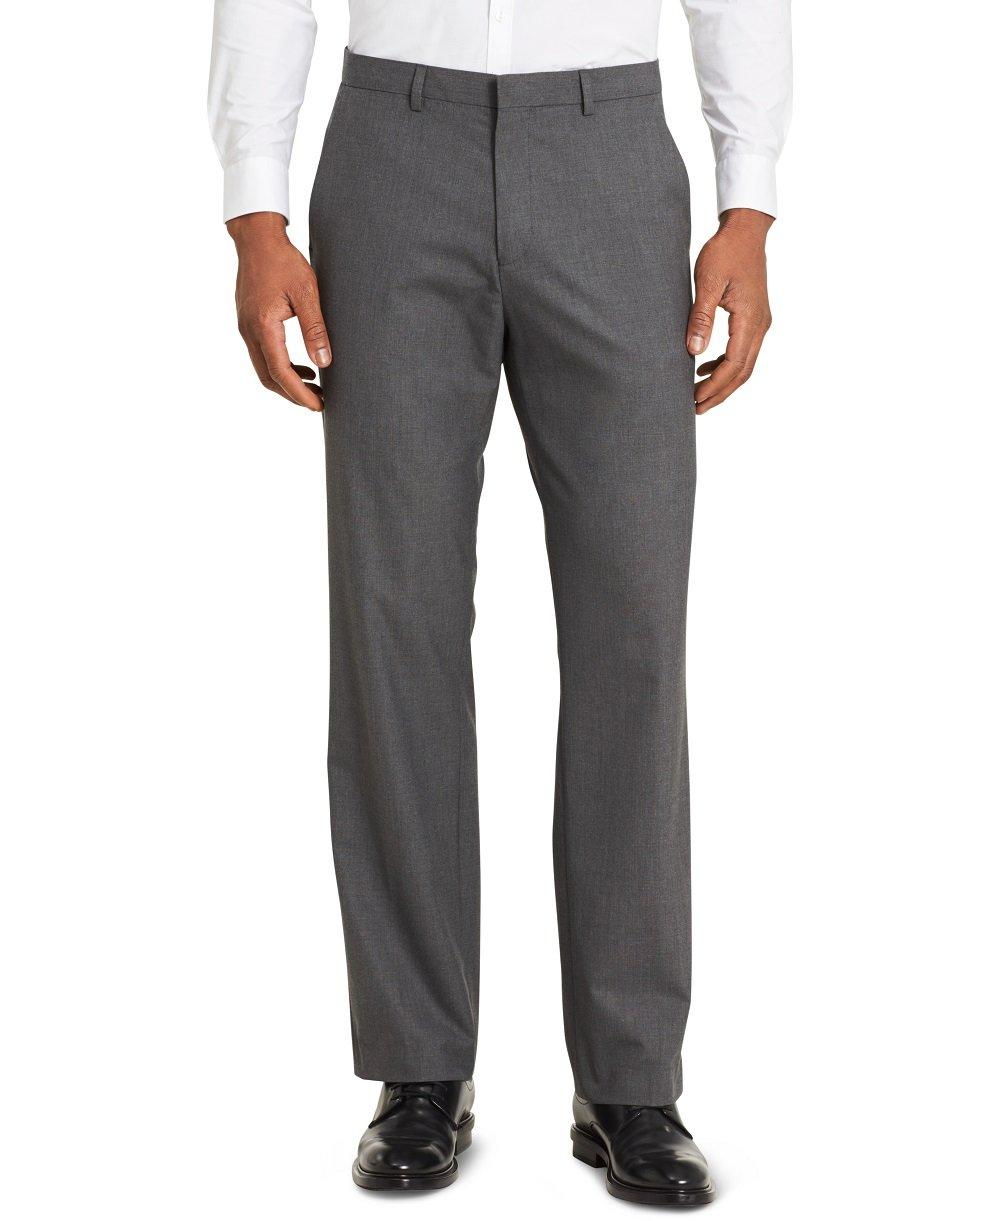 Calvin Klein Men's Infinite Slim Fit Trouser Suit Pant 4-Way Stretch, Iron Gate, 42W 32L